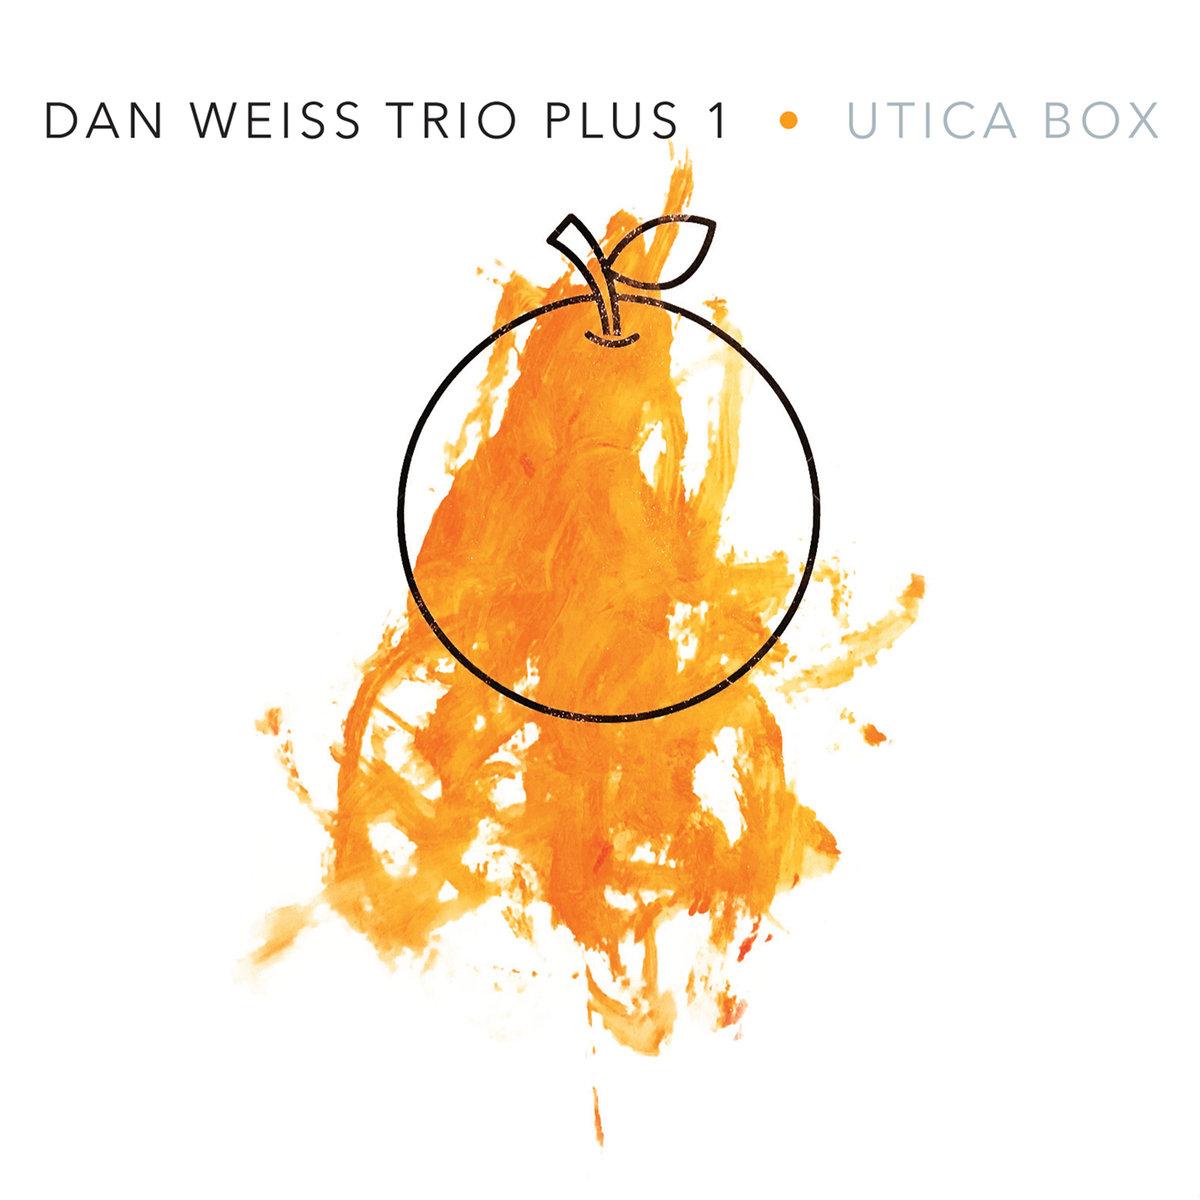 DAN WEISS - Dan Weiss Trio Plus 1 : Utica Box cover